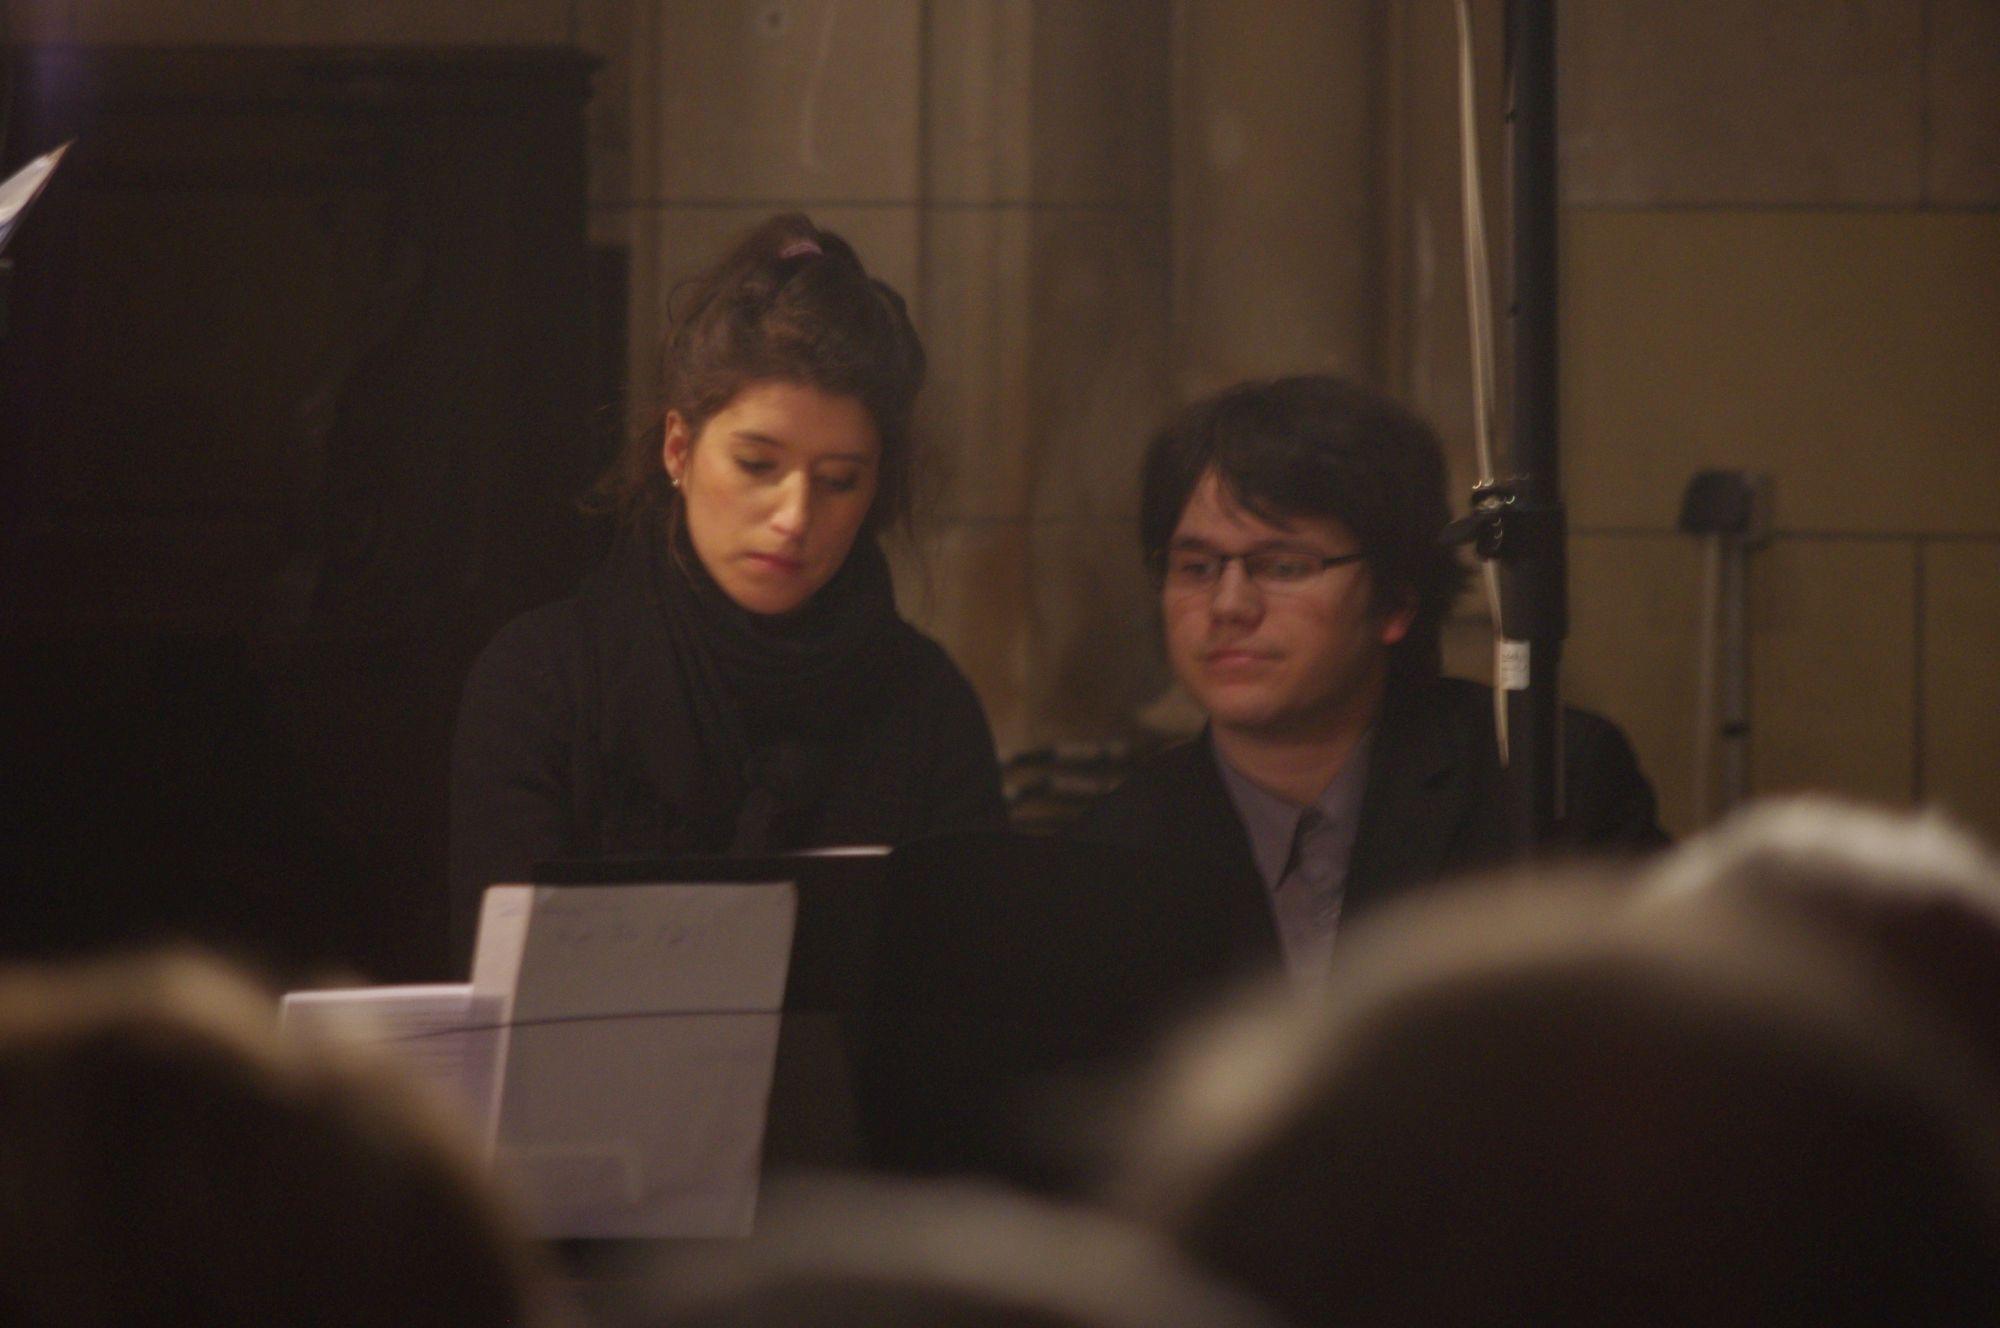 Auriane Sacoman-Marsal au clavier